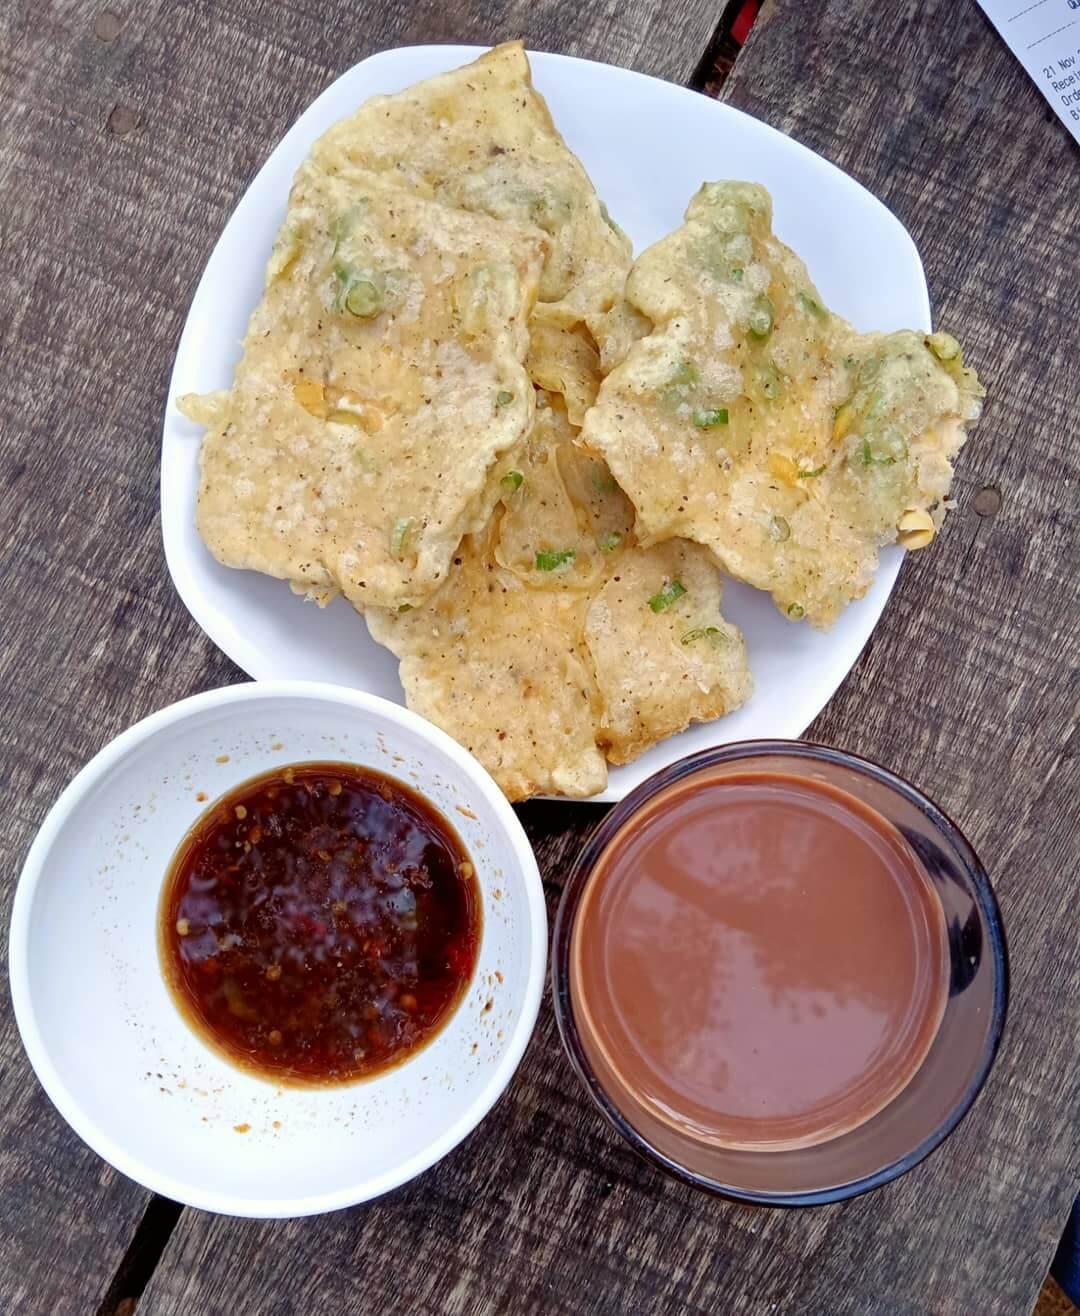 tempe mendoan kuliner khas cilacap